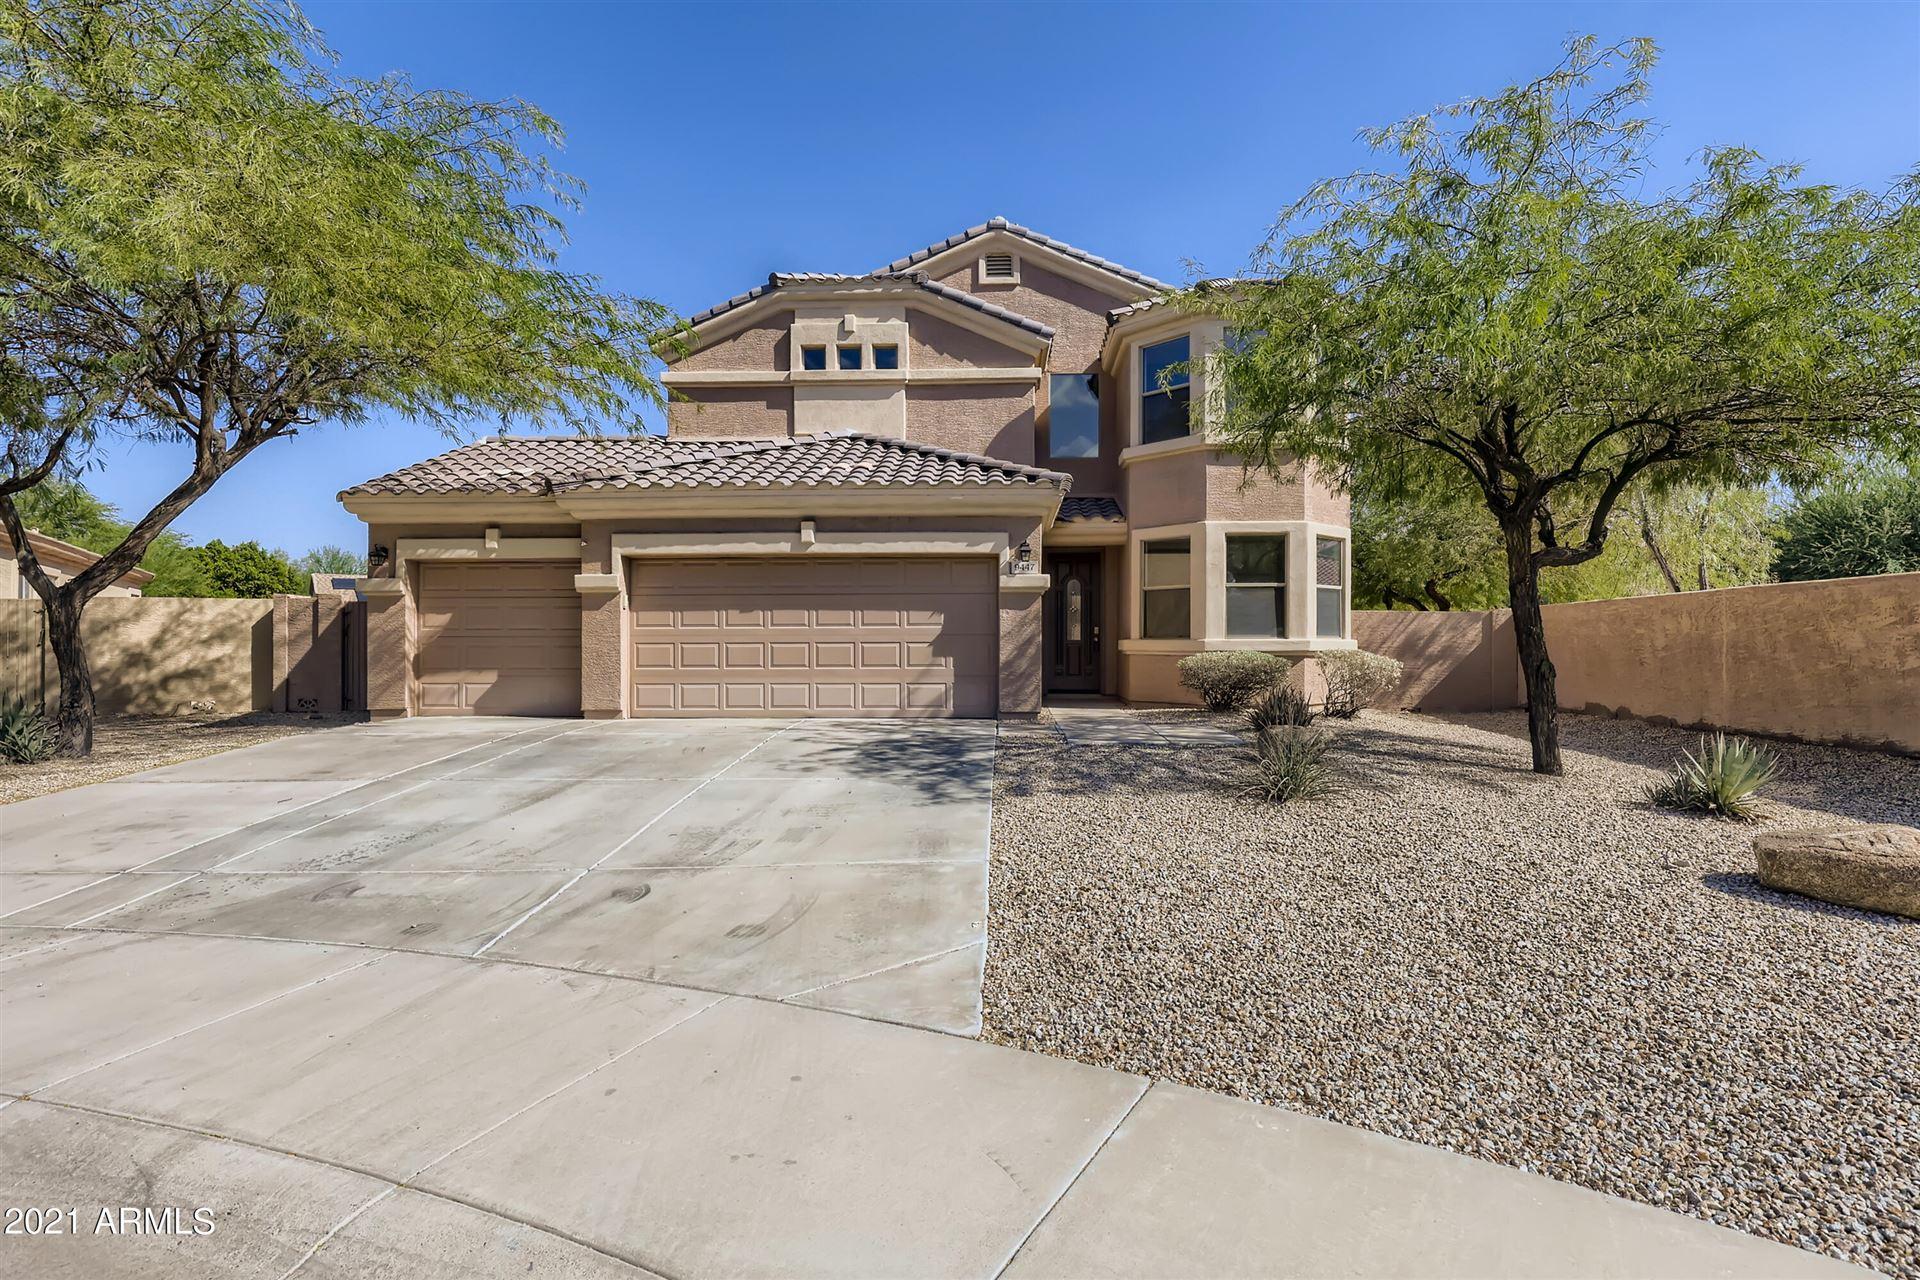 Photo of 9447 S 183RD Lane, Goodyear, AZ 85338 (MLS # 6307456)